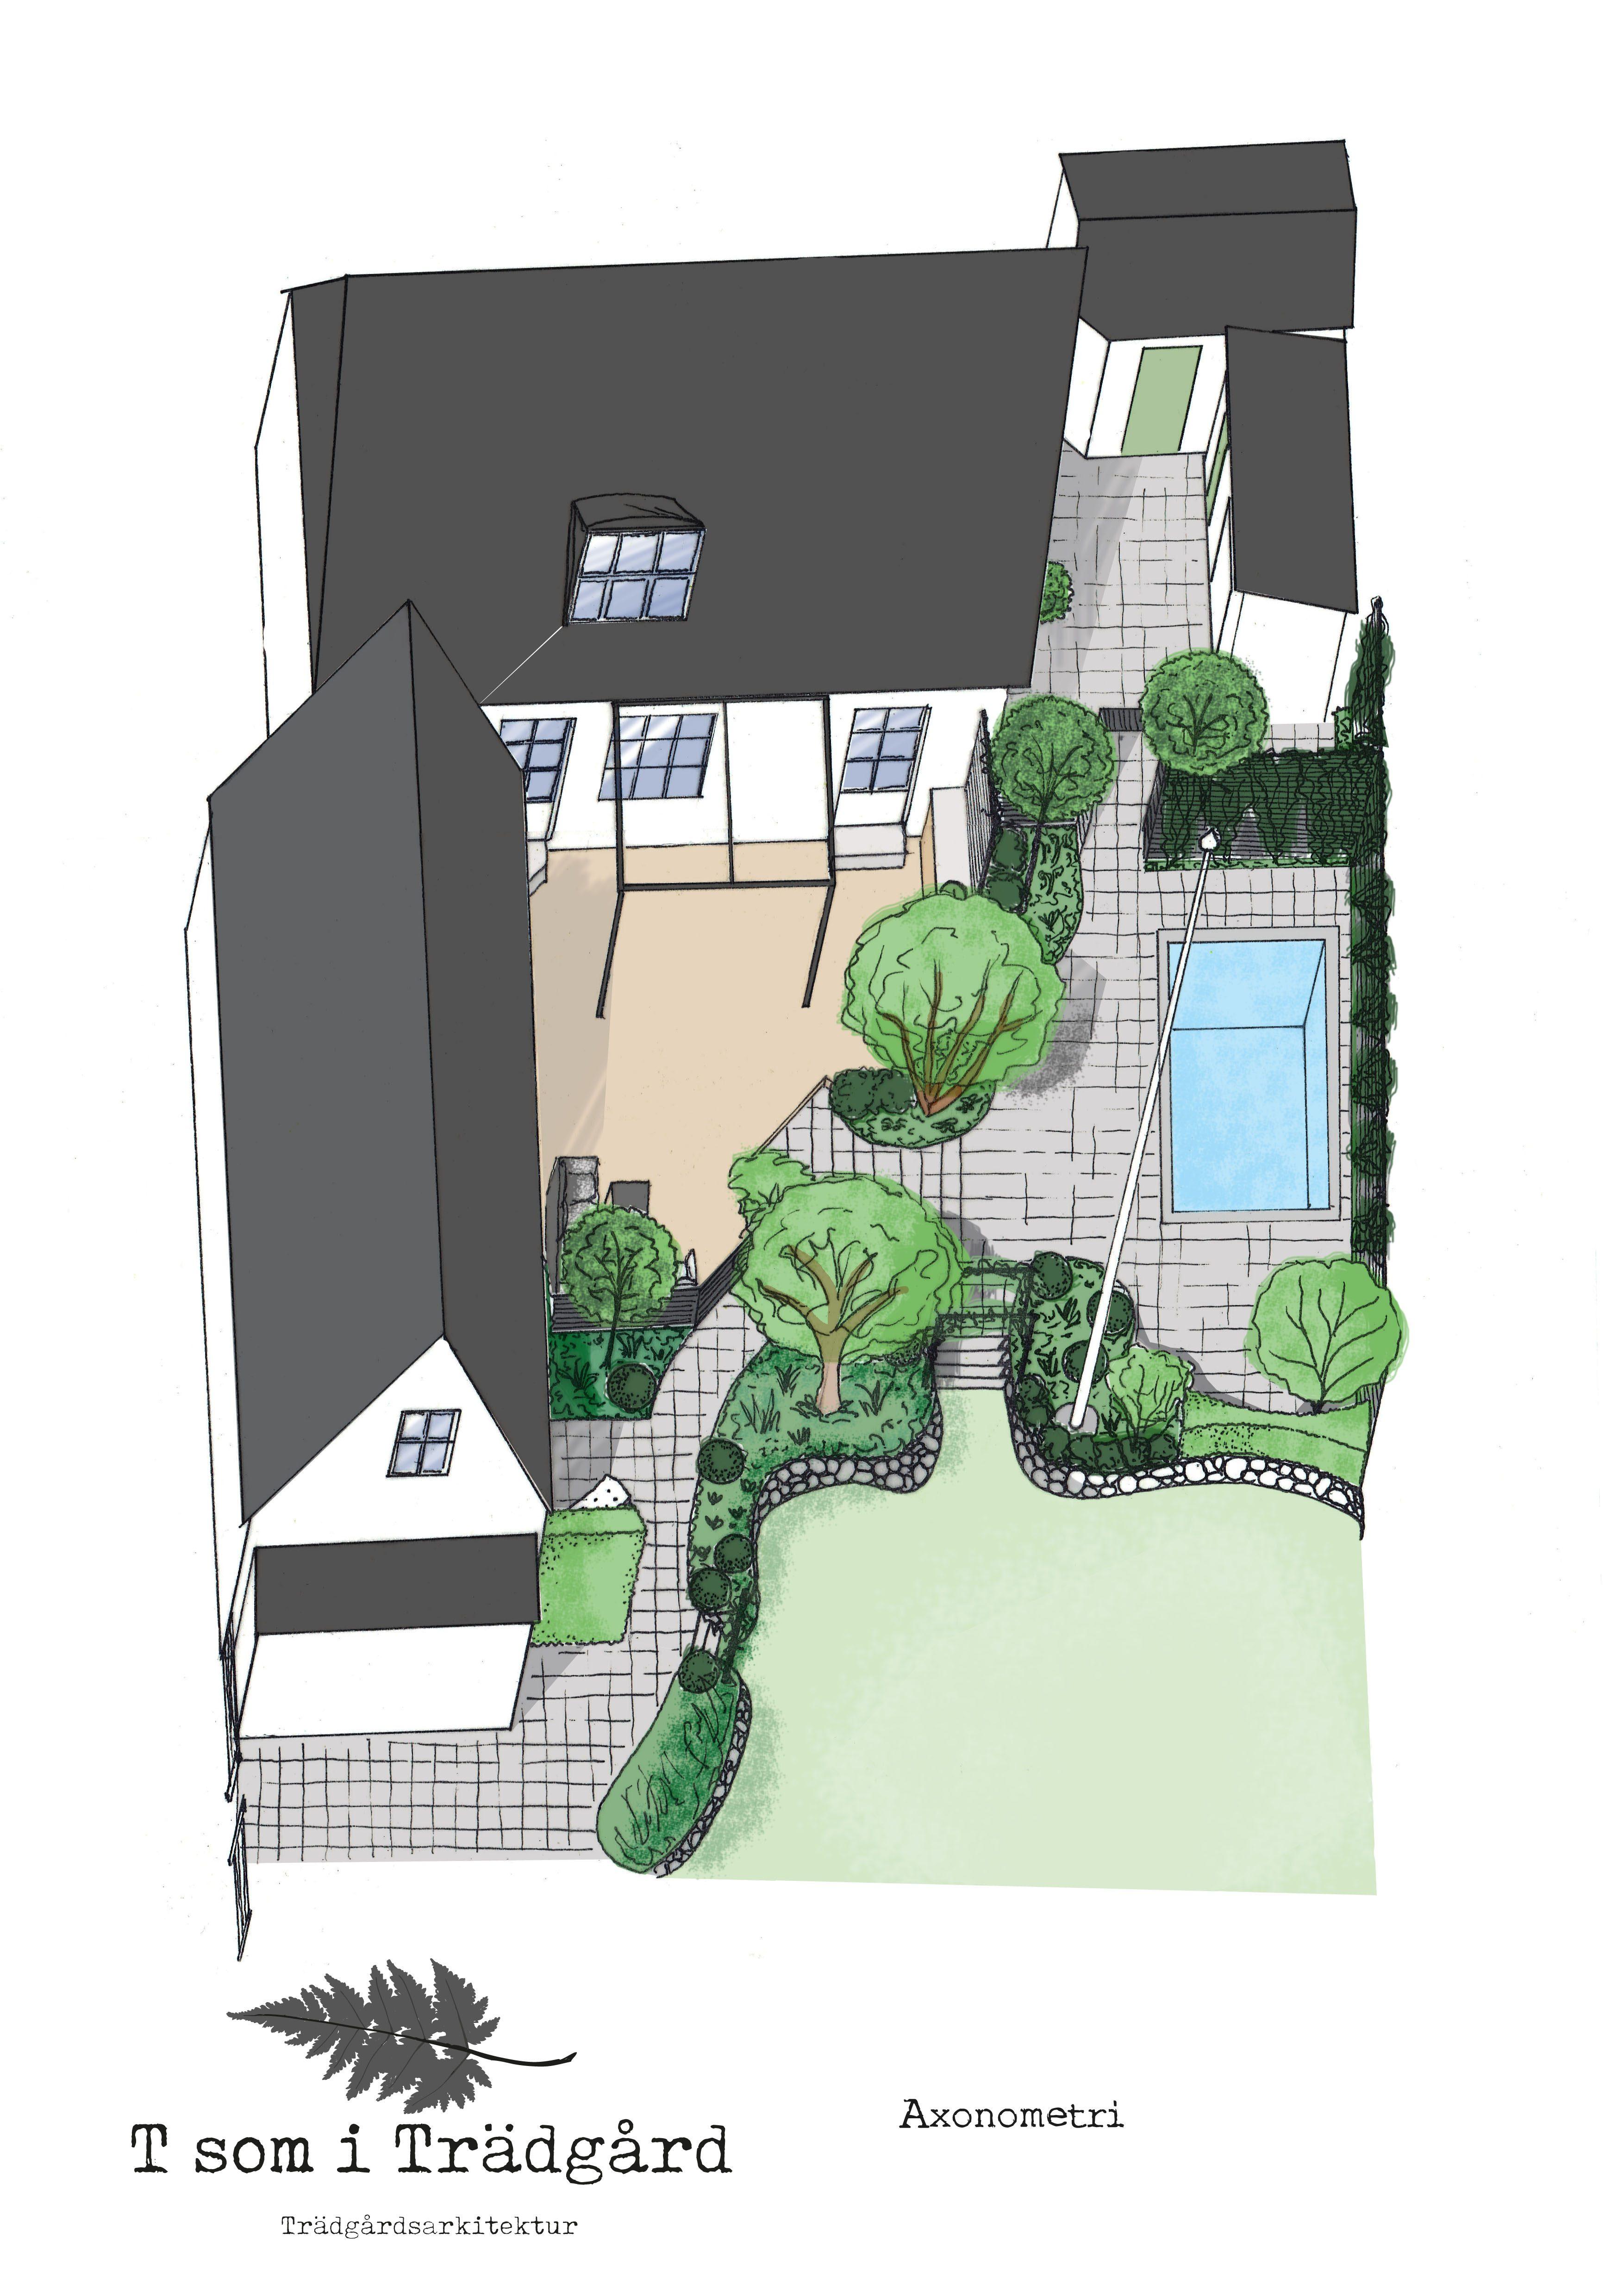 Trädgårdsarkitektur, poolträdgård, trädgårdsdesign, uteplats